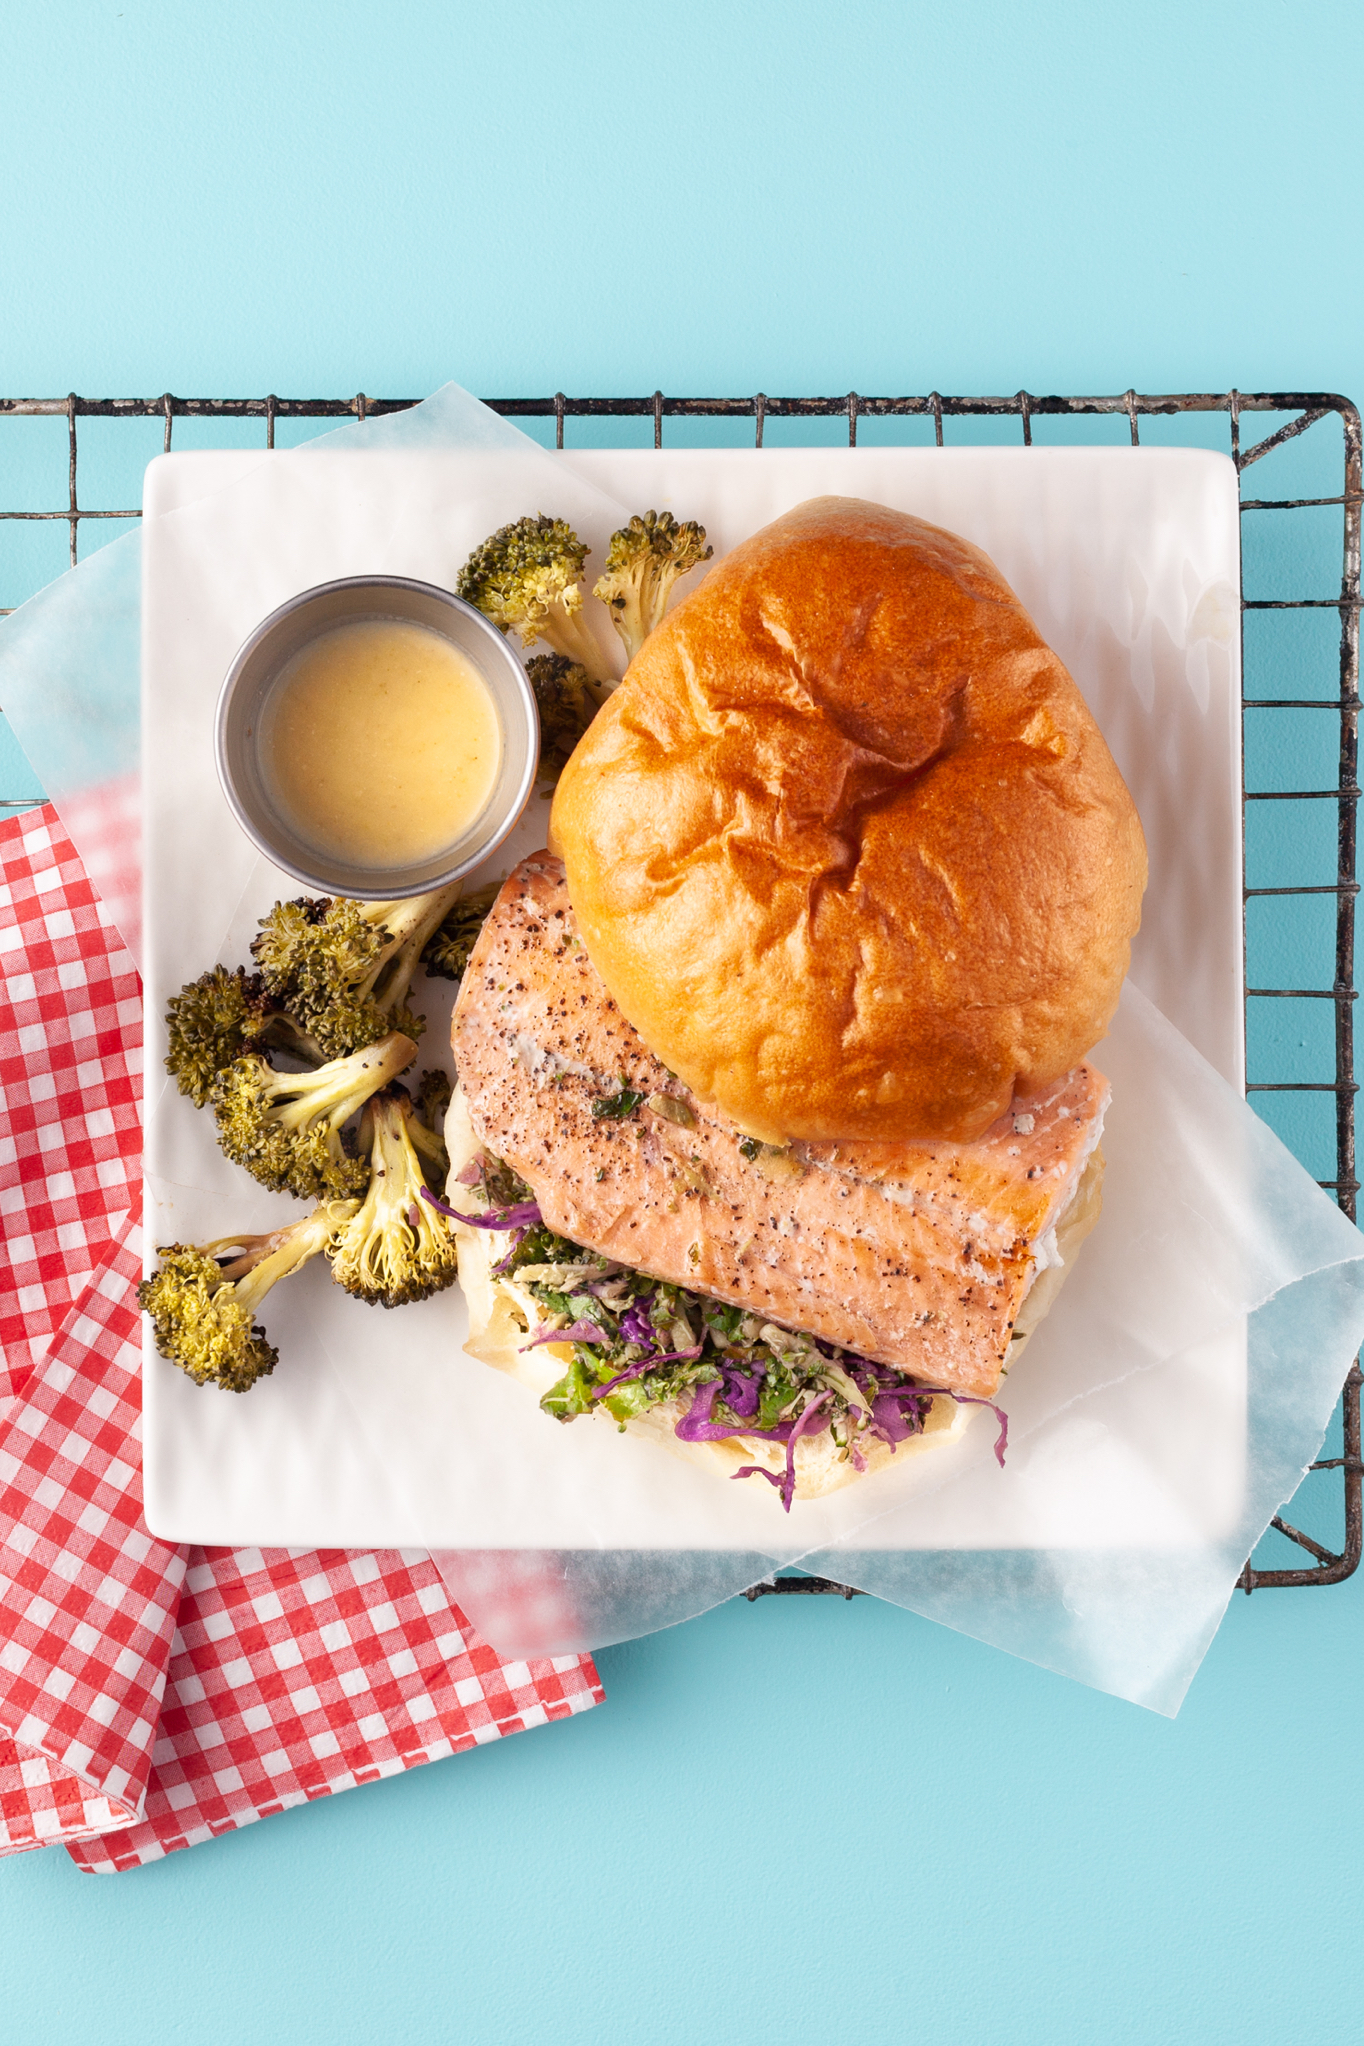 Kale Wild Salmon Burger